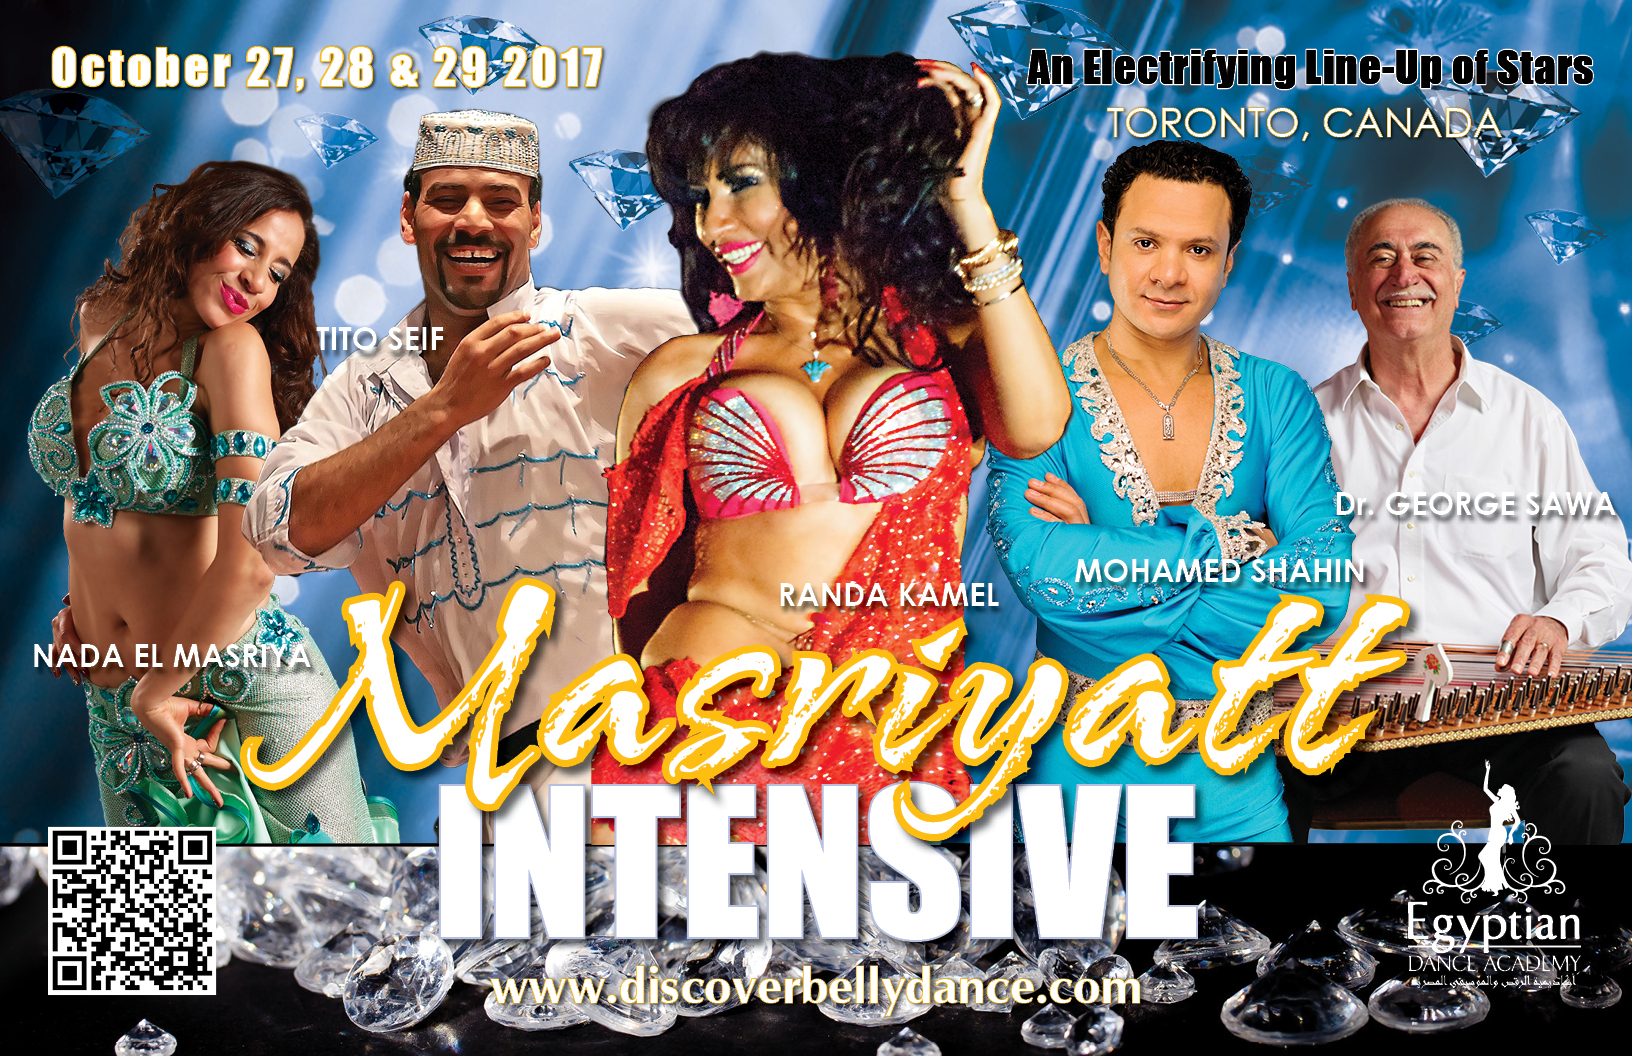 MASRIYATT INTENSIVE 2017